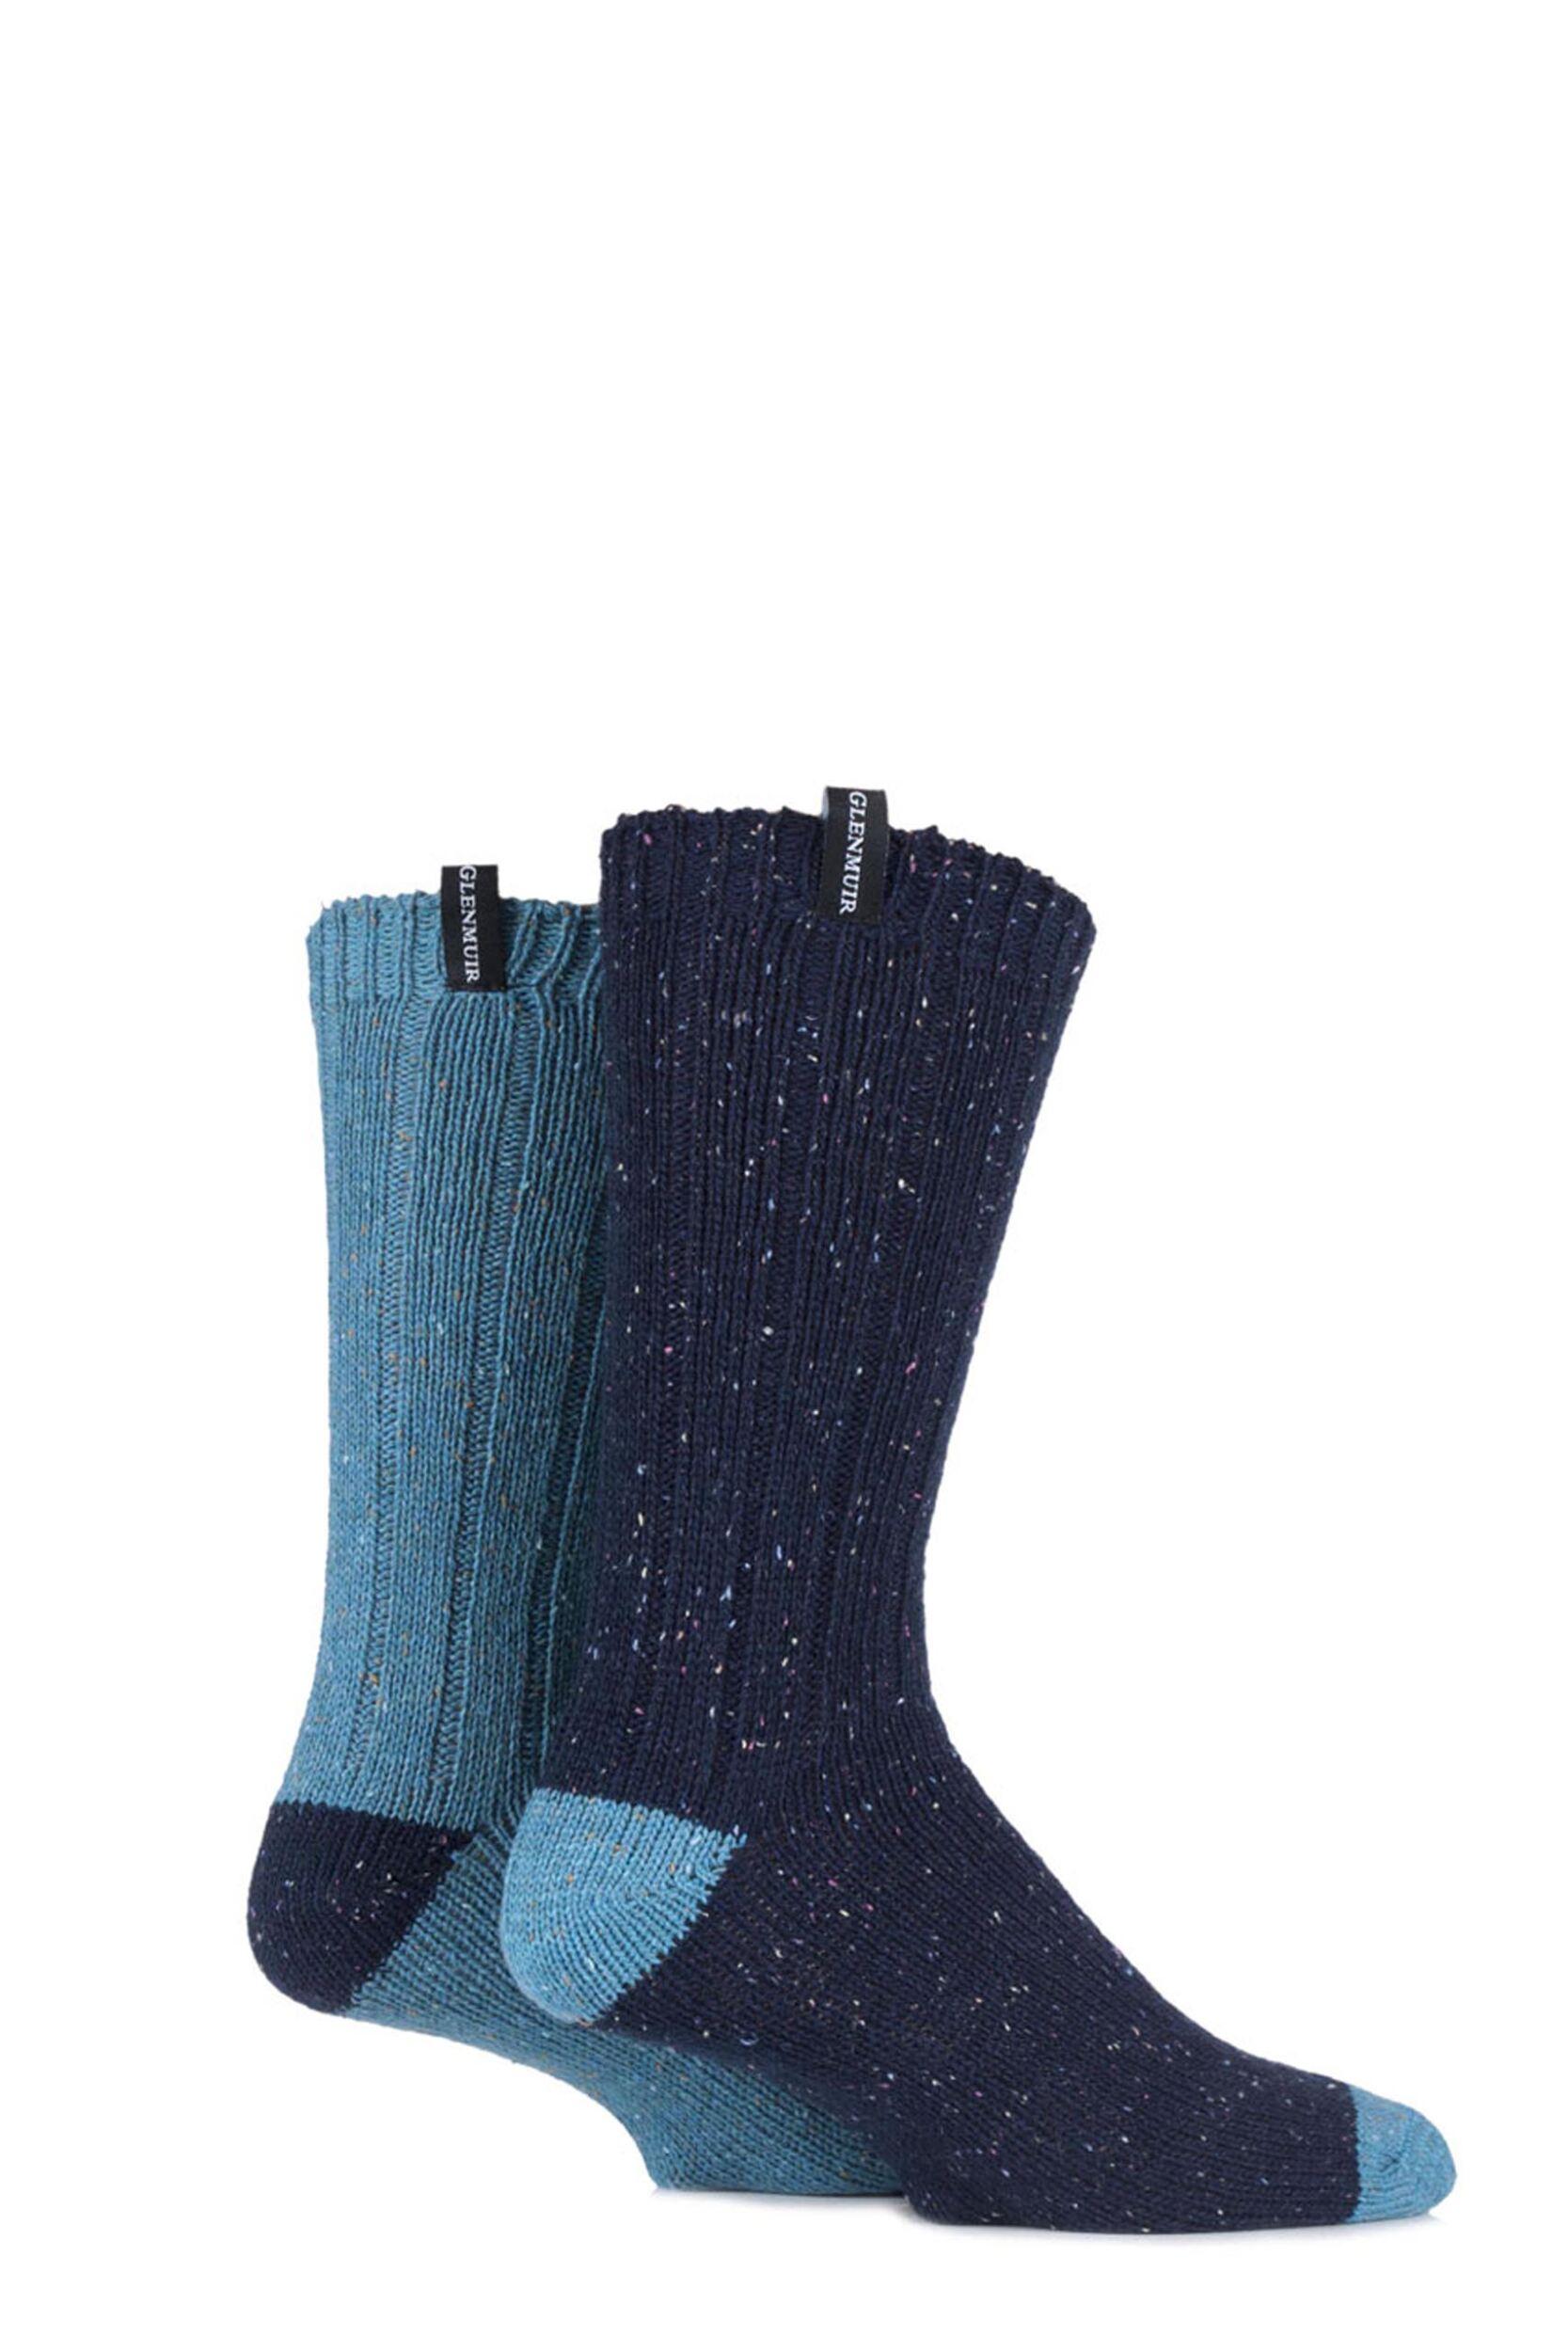 mens 2 pair glenmuir merino wool blend ribbed marl boot